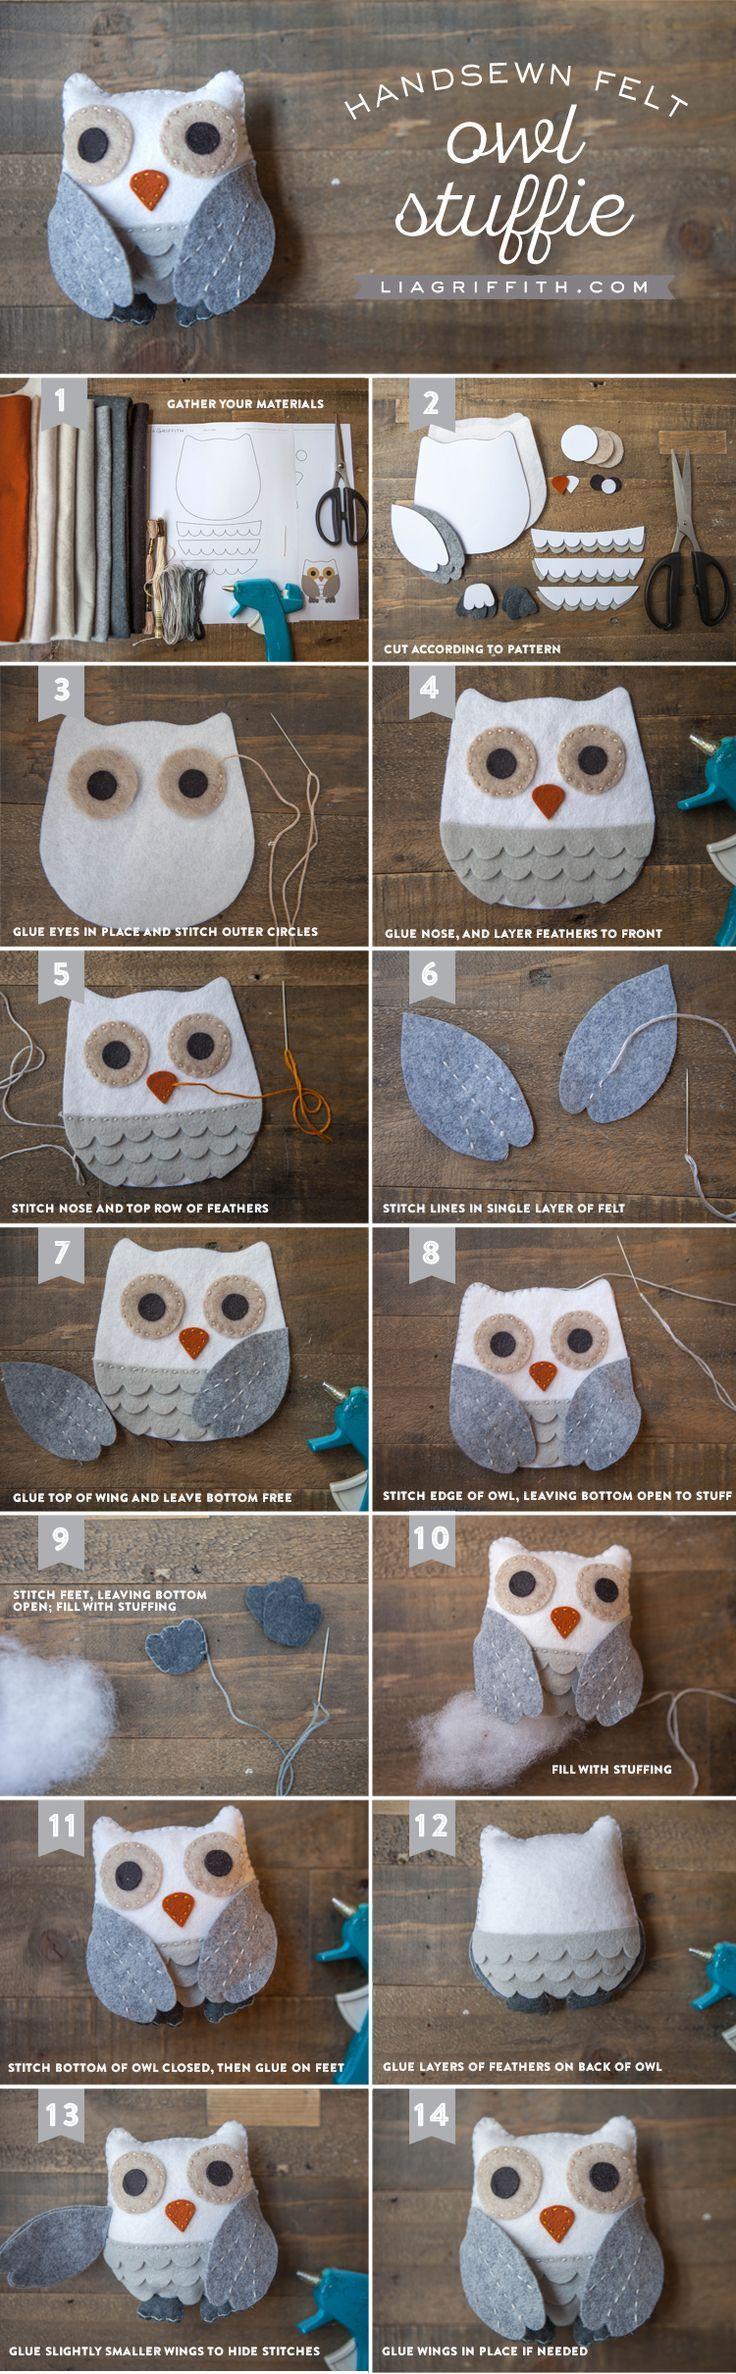 Owl crafts baby bedding nursery decor nursery crafts forward pink owl - Felt Owl Stuffie